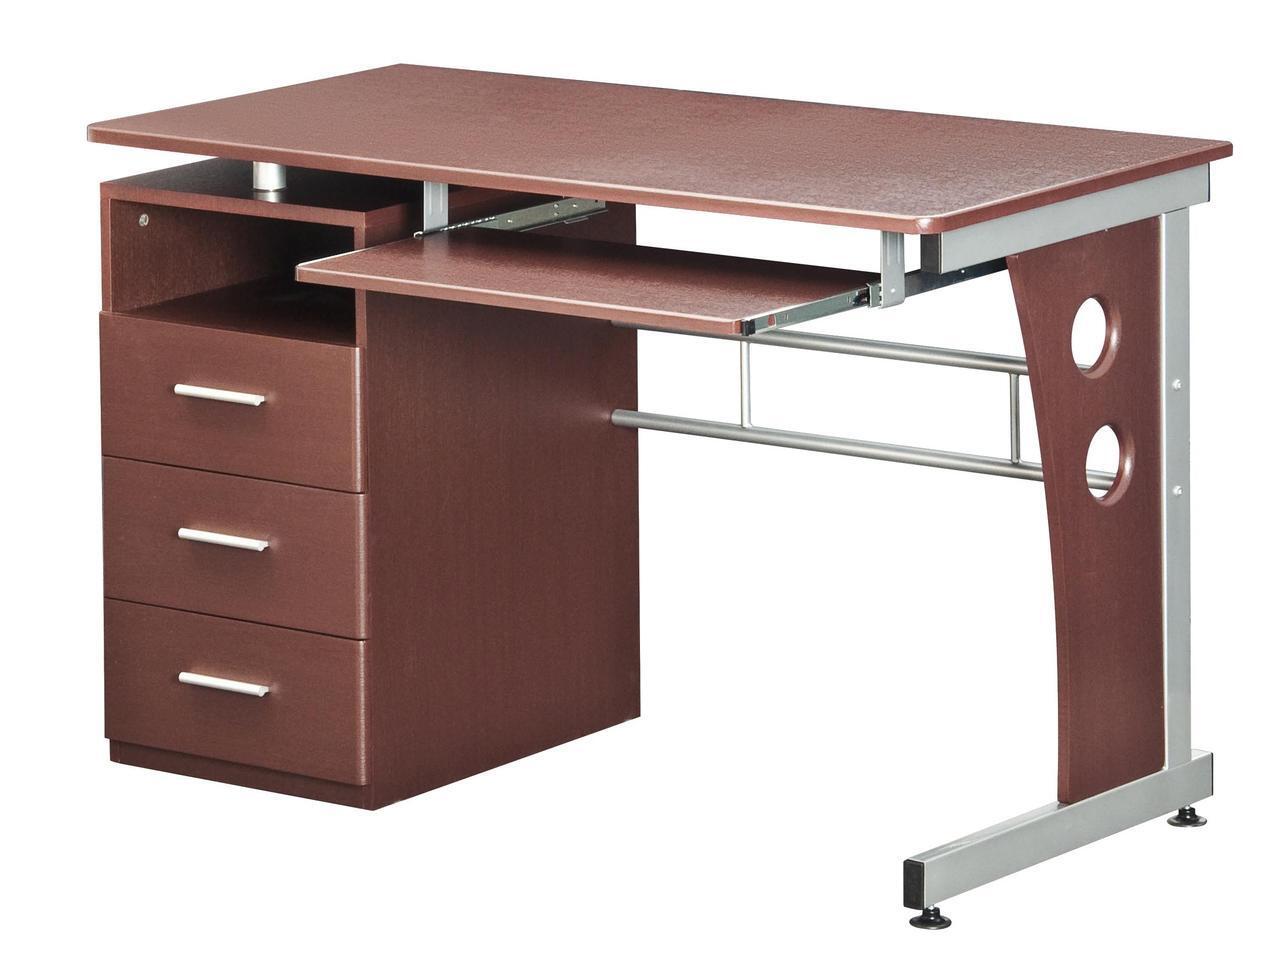 Rta Products Rta3520ch36 Computer Desk Appliances Connection